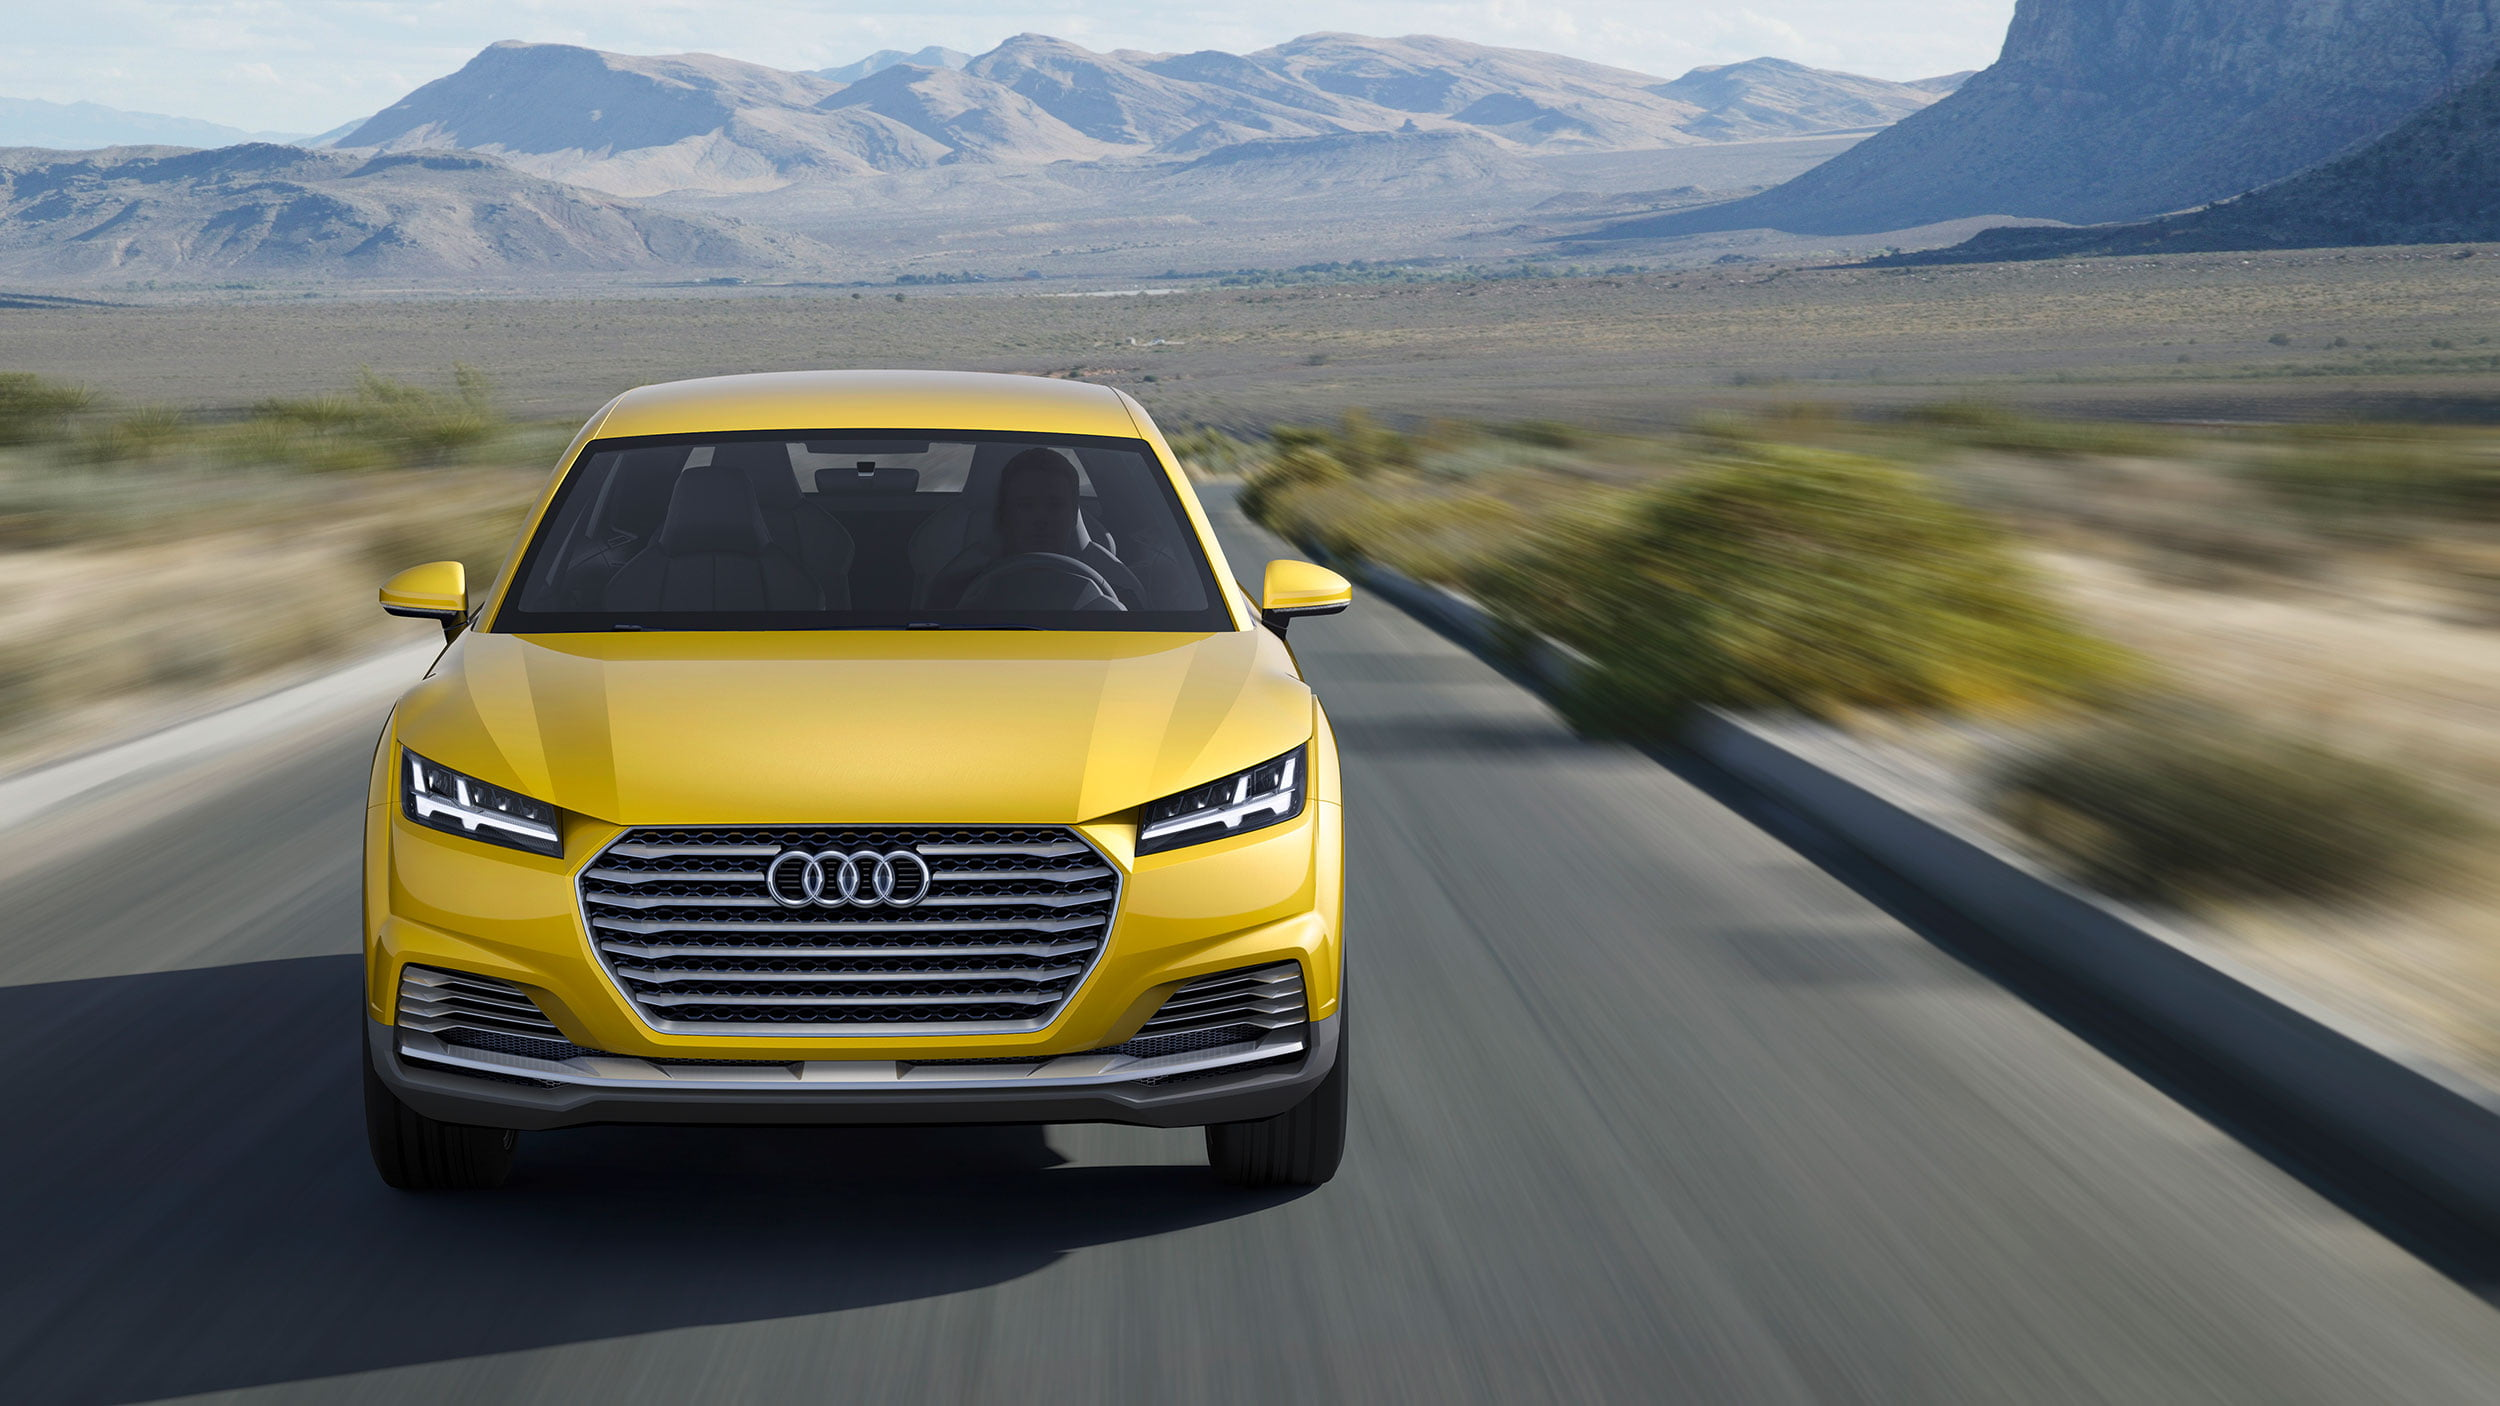 Audi TT offroad frontal